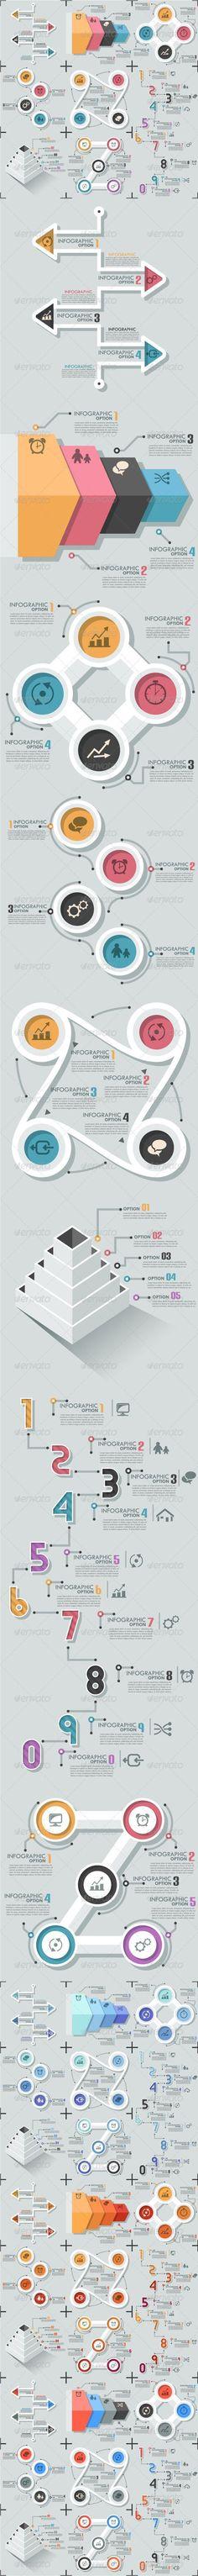 Business infographic : Business infographic : Set Of 8 Flat Infographic Options Templates #design Downl